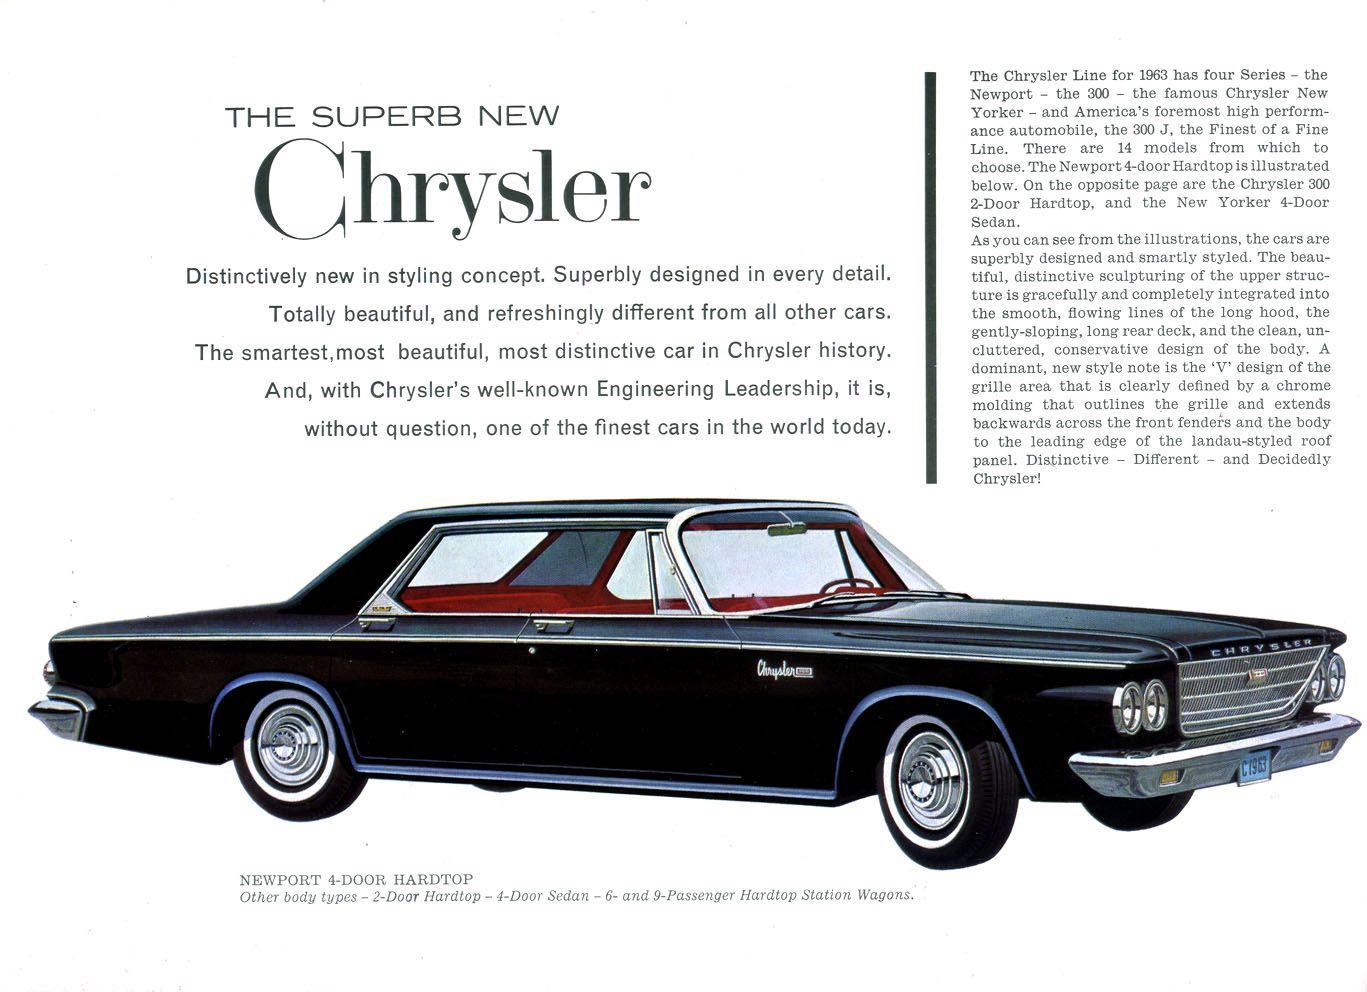 1963 Chrysler Plymouth Brochure   Vintage Car Ads   Pinterest ...